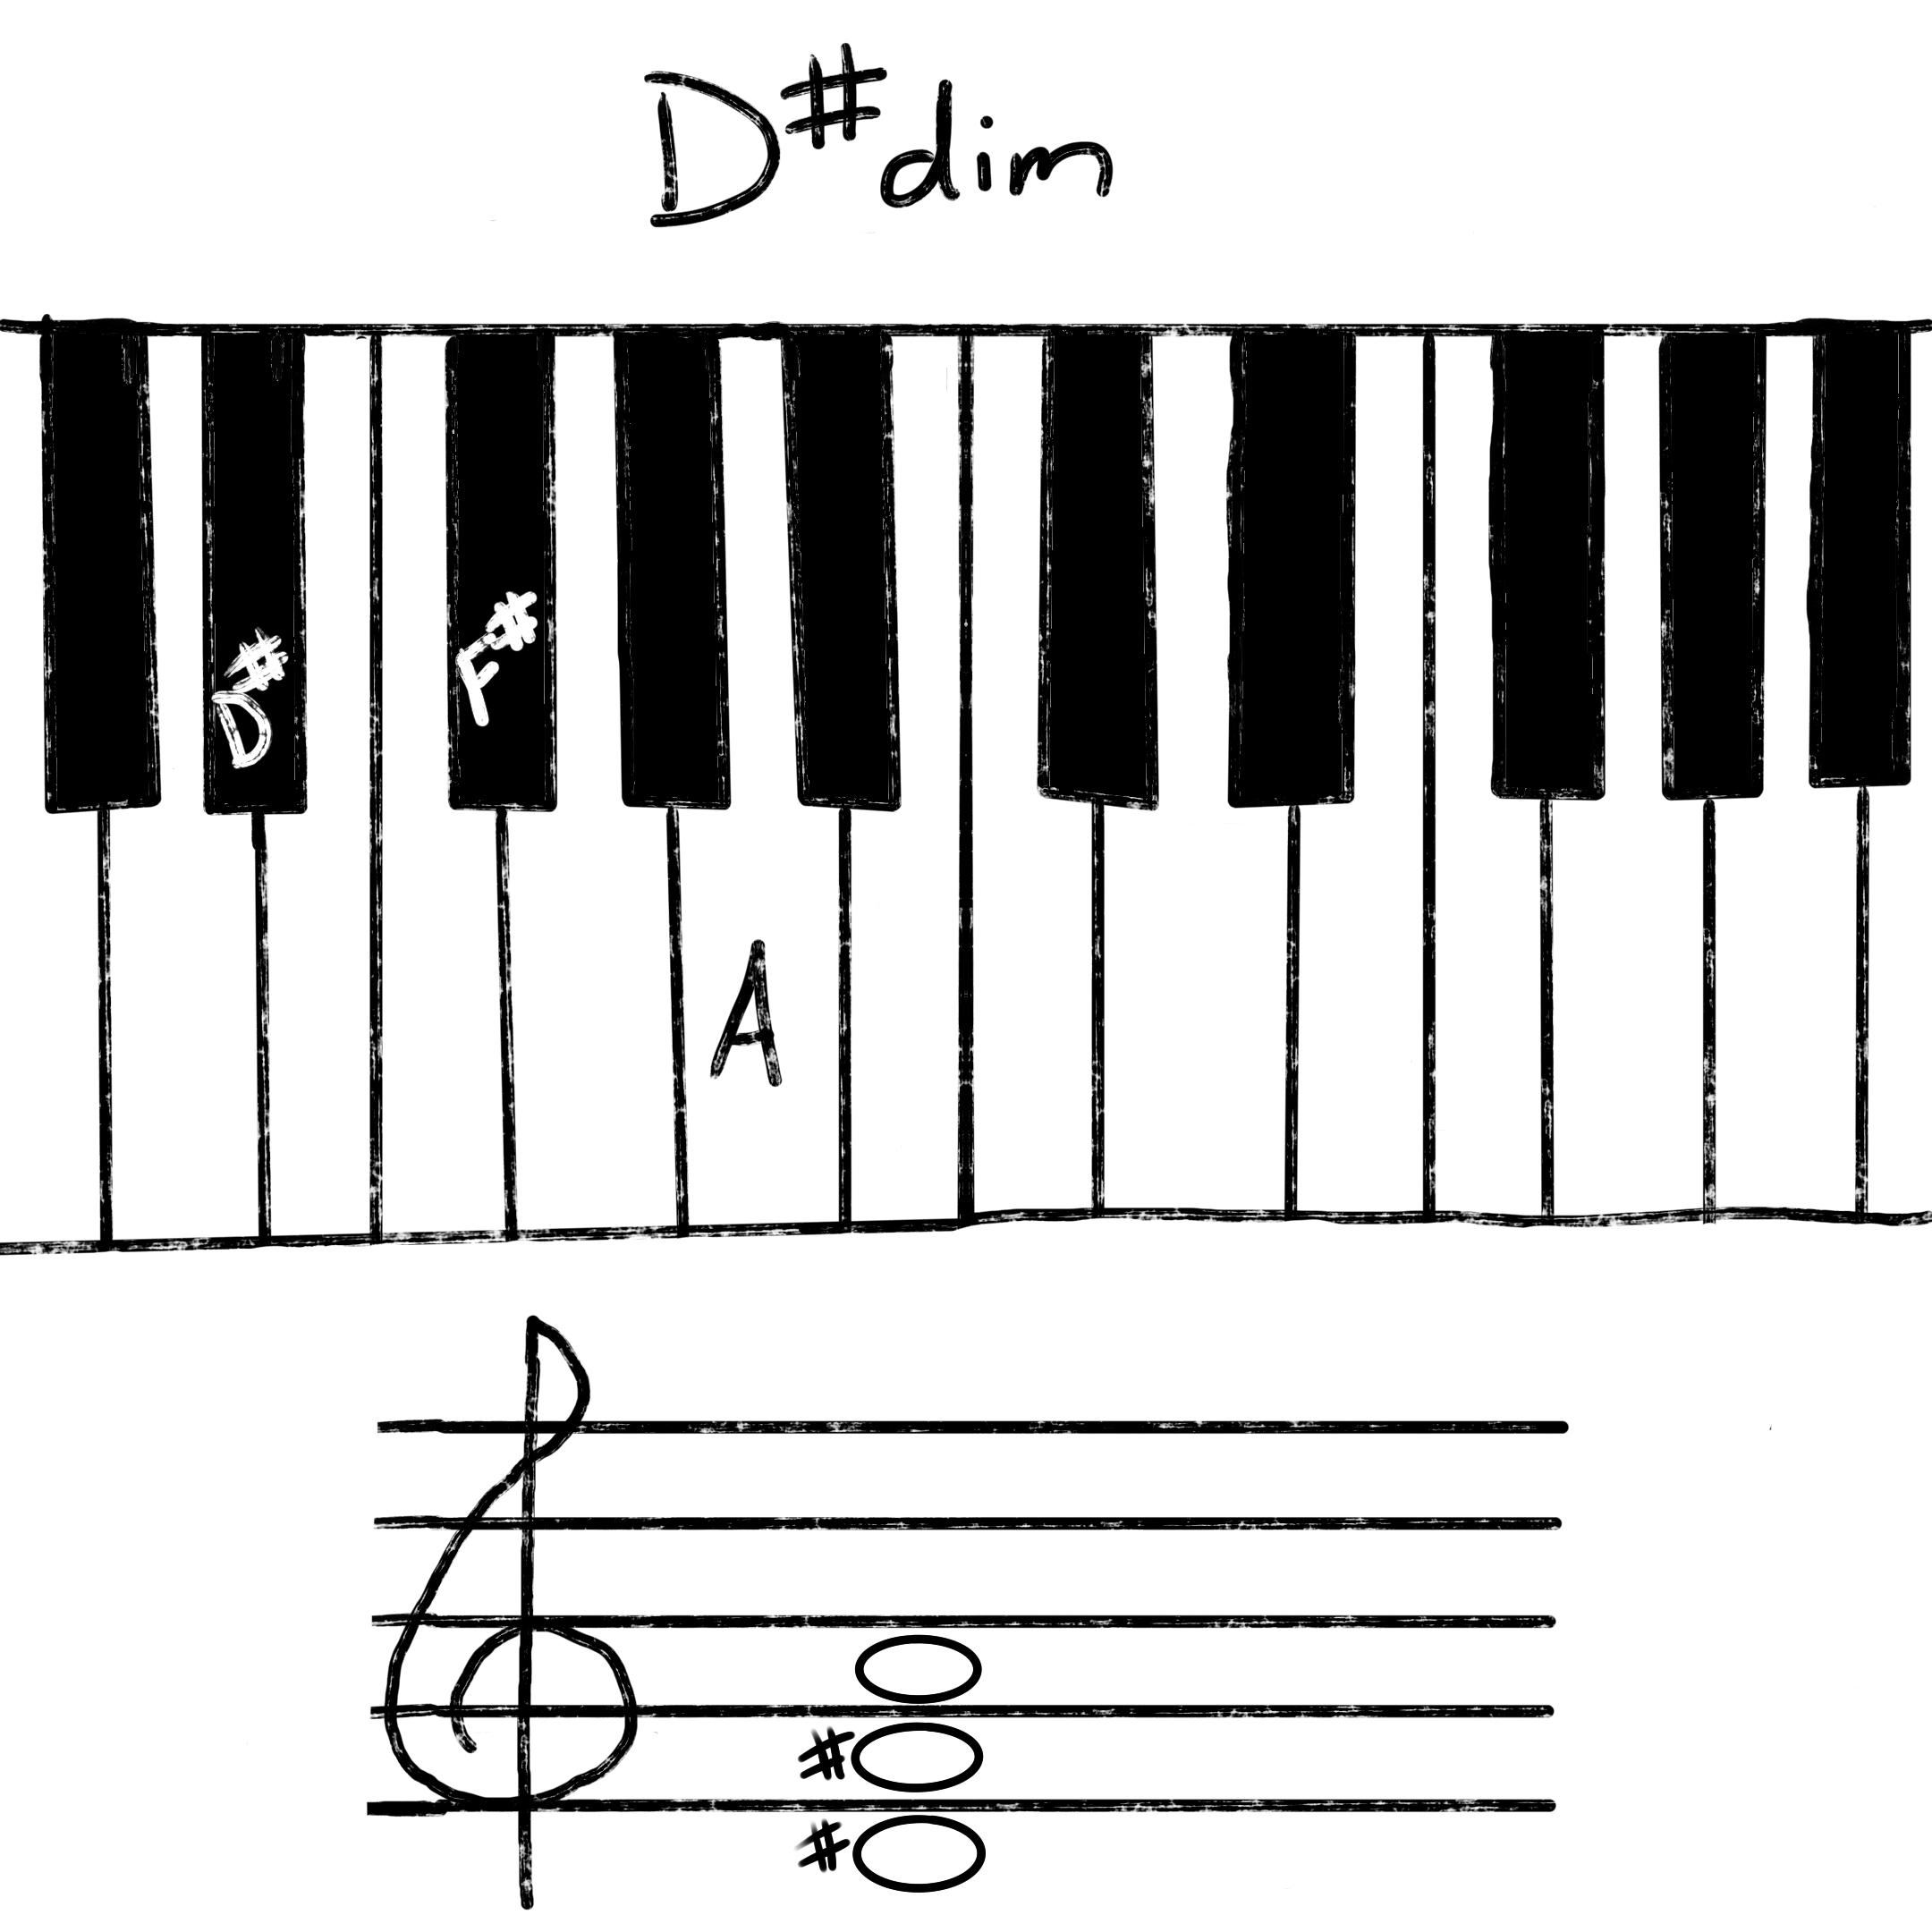 D#dim